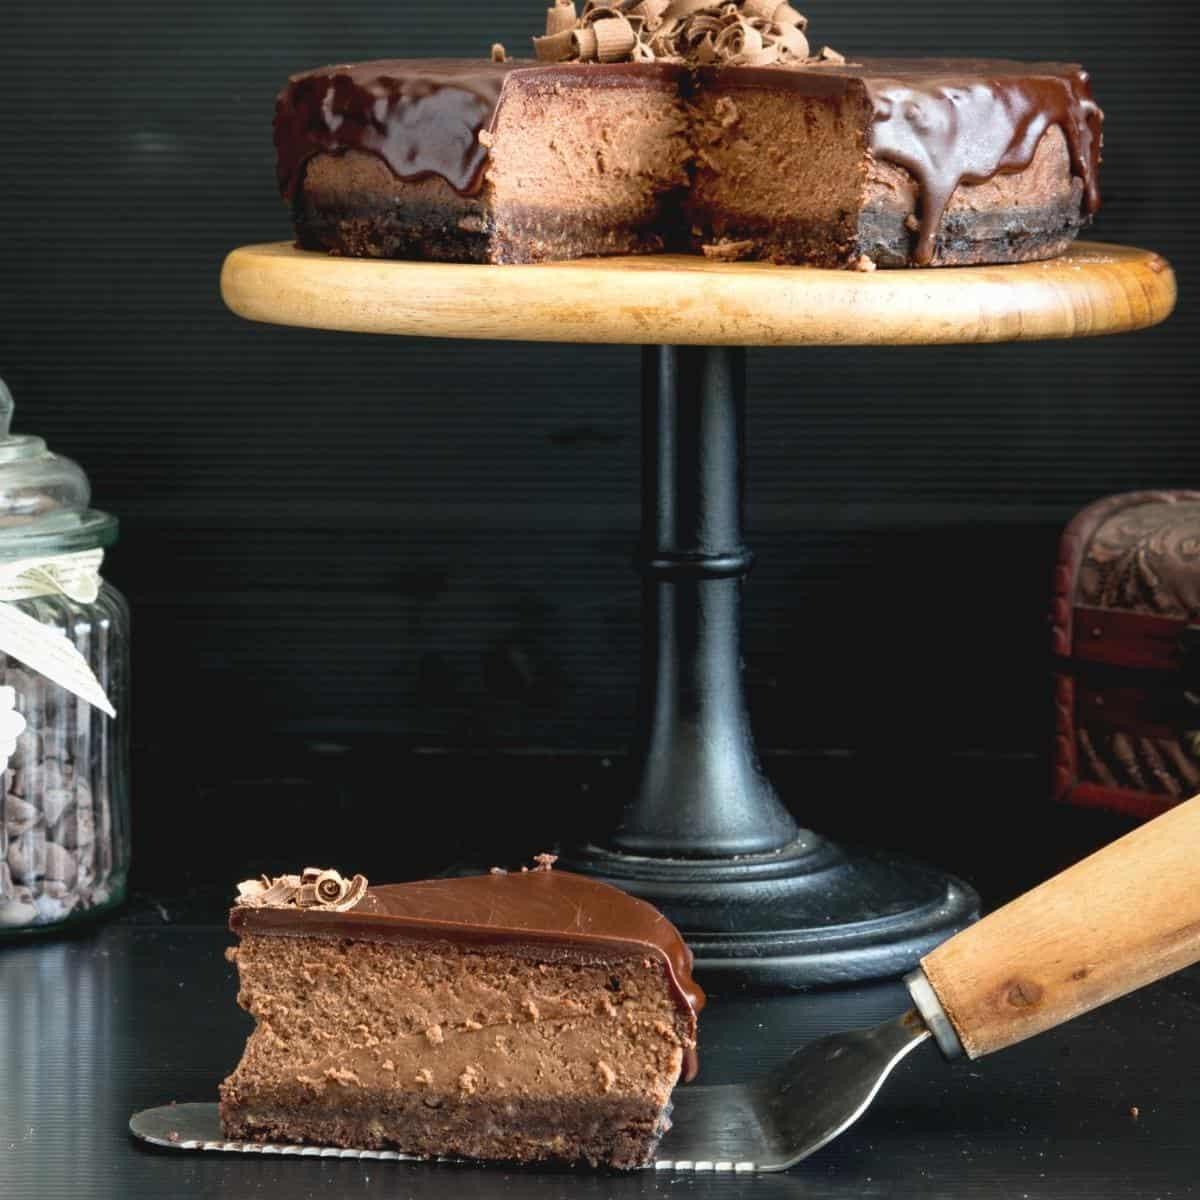 Sliced Chocolate cheesecake on a cake stand.